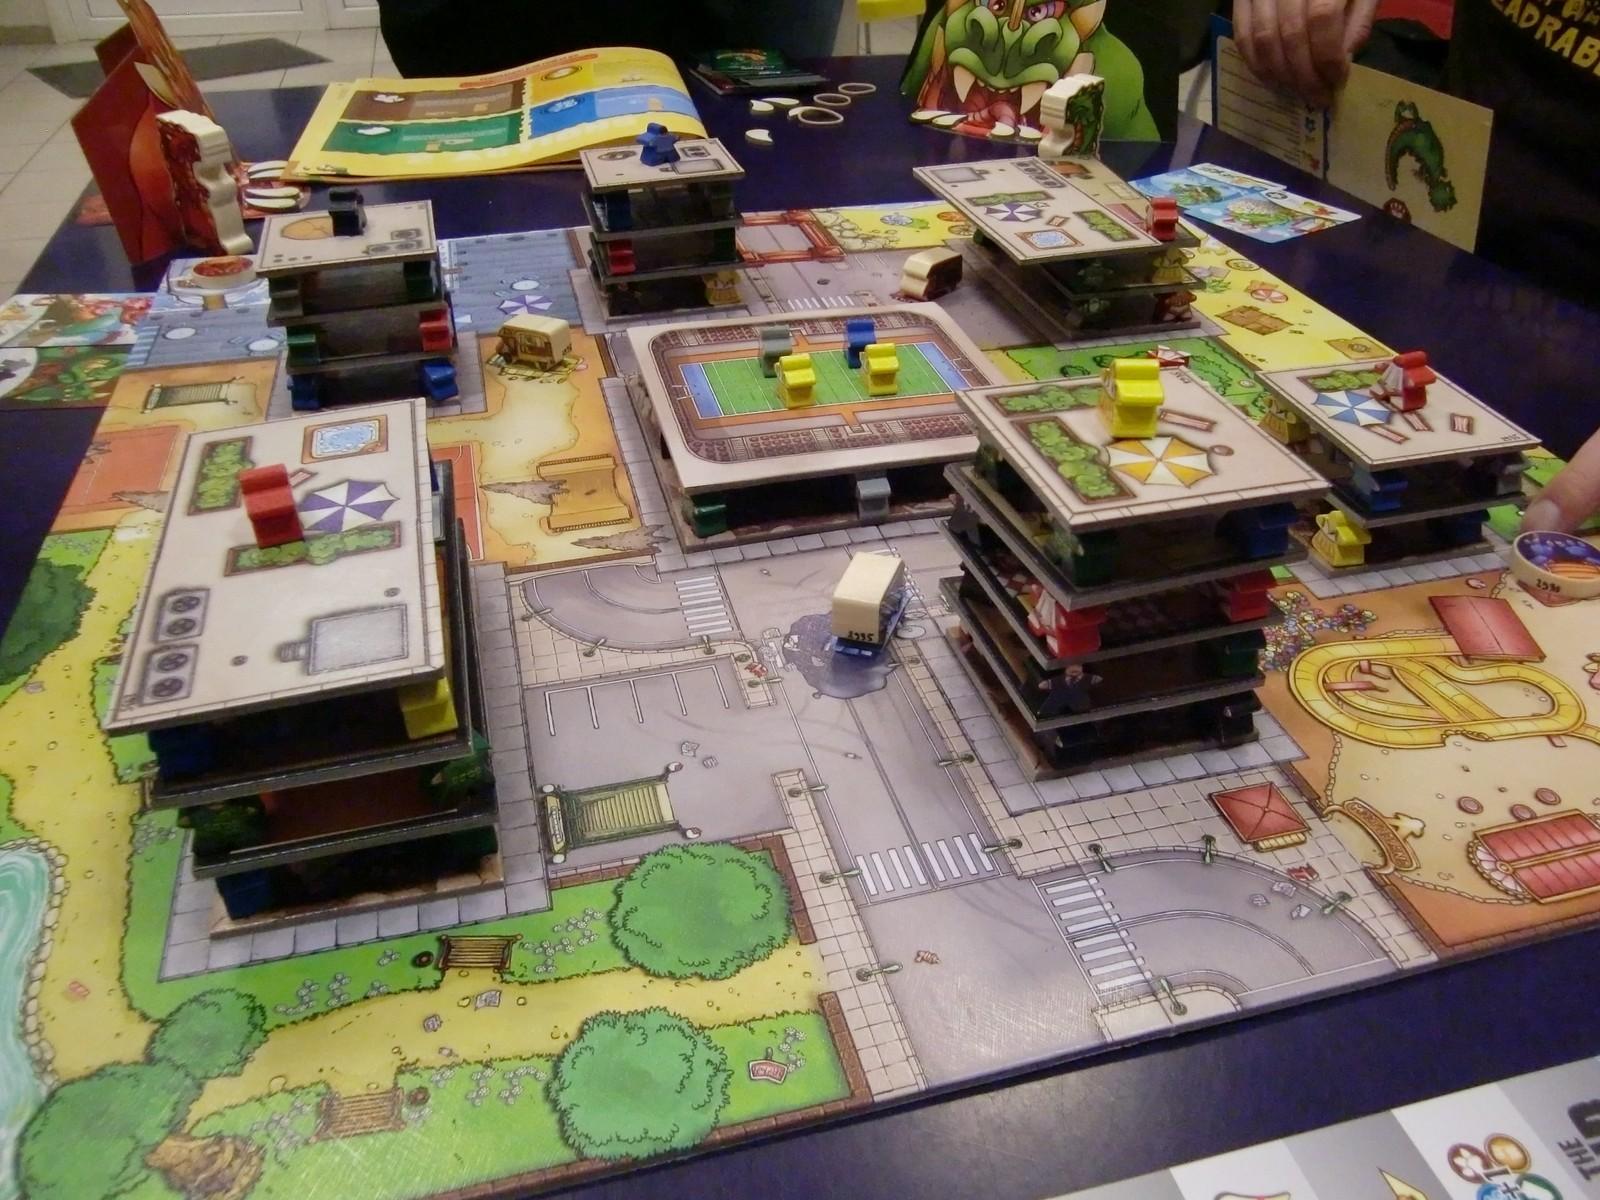 Rampage : la jolie ville de Meeple City